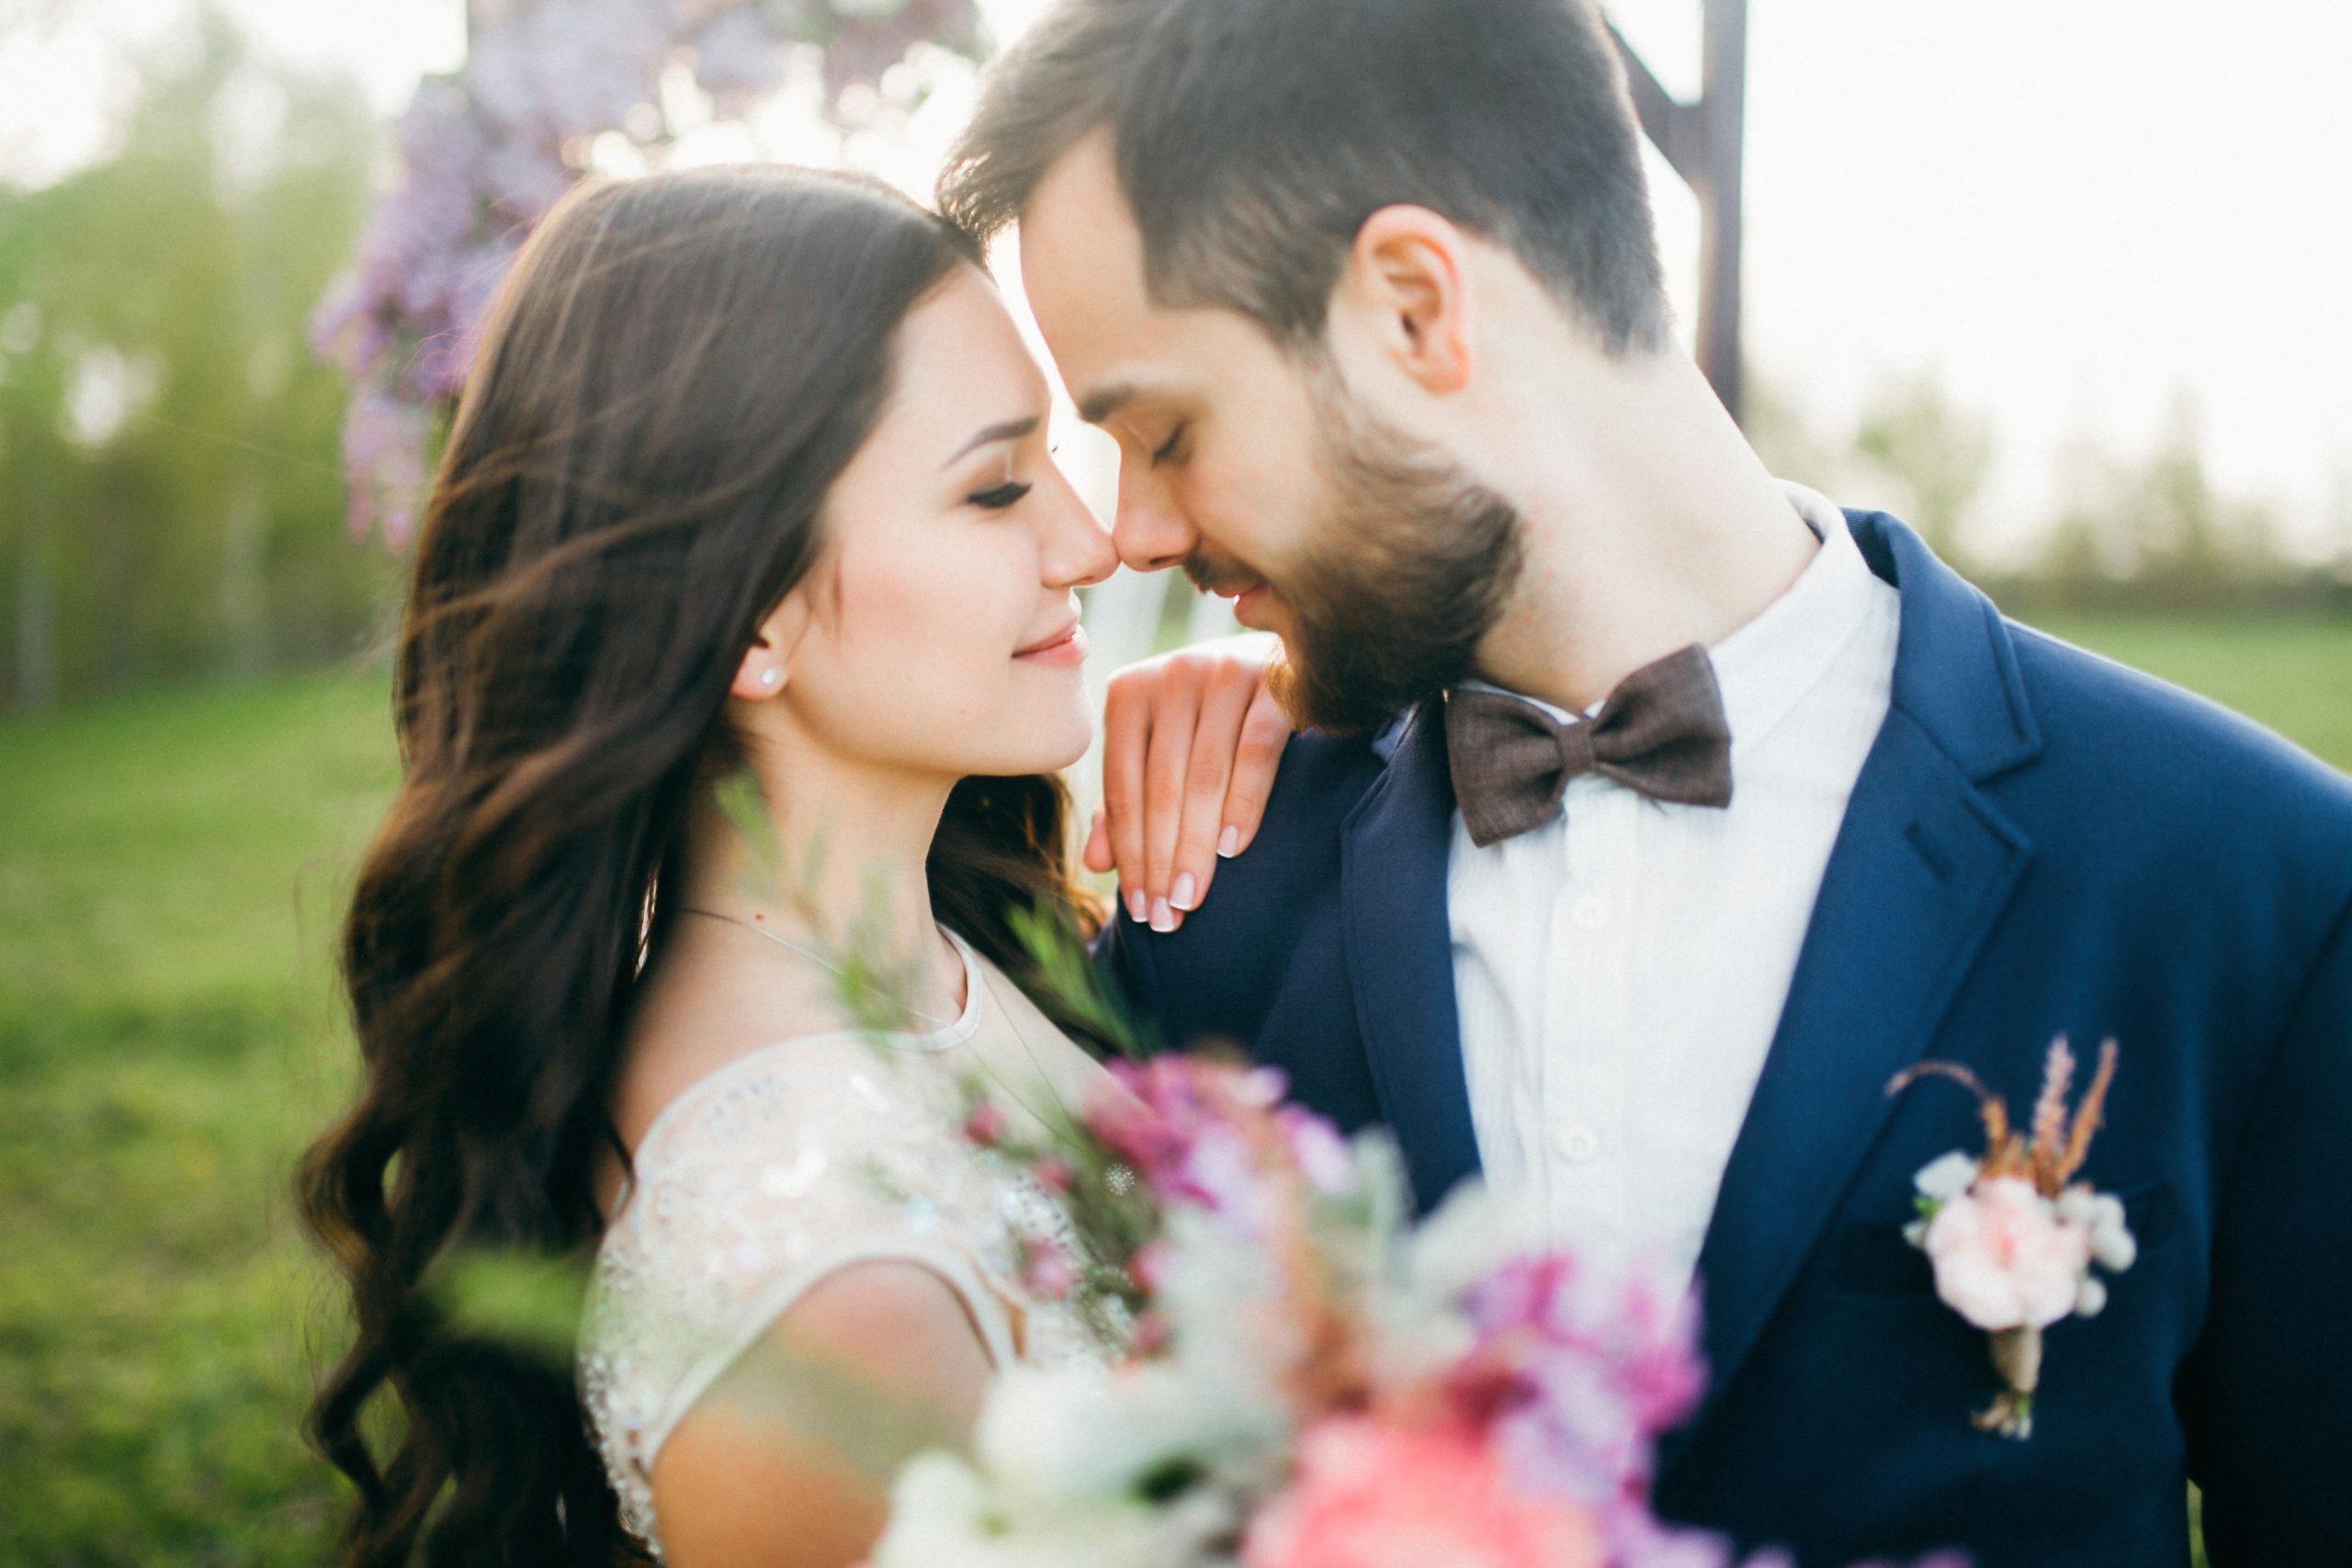 Happy,Bride,And,Groom,After,Wedding,Ceremony